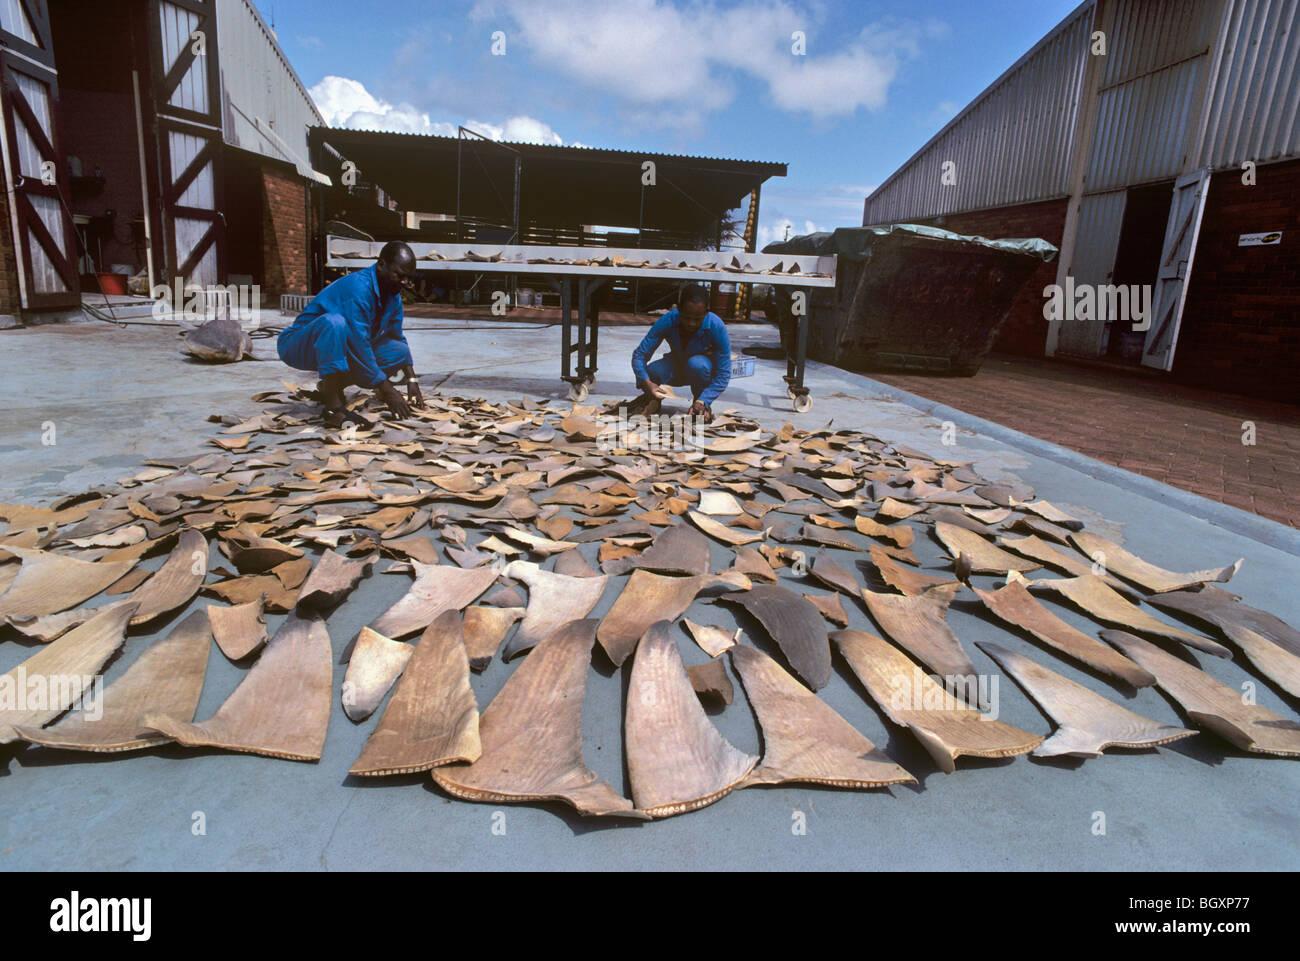 drying shark fins to hong kong for shark fin soup and medicine